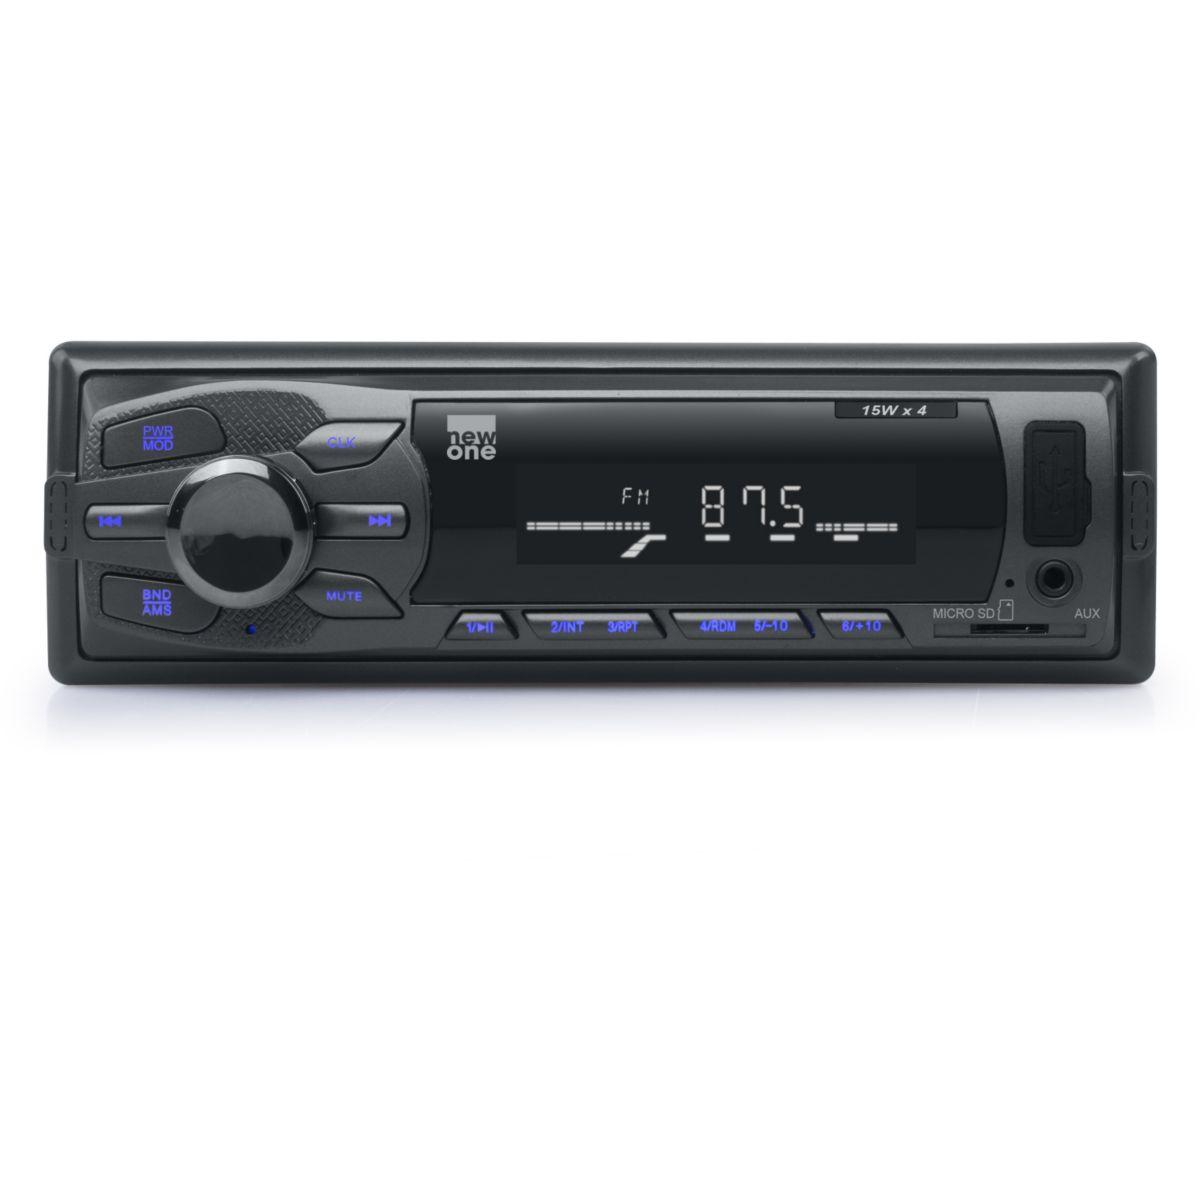 Autoradio mp3 newone ar 260 - 2% de remise imm�diate avec le code : deal2 (photo)